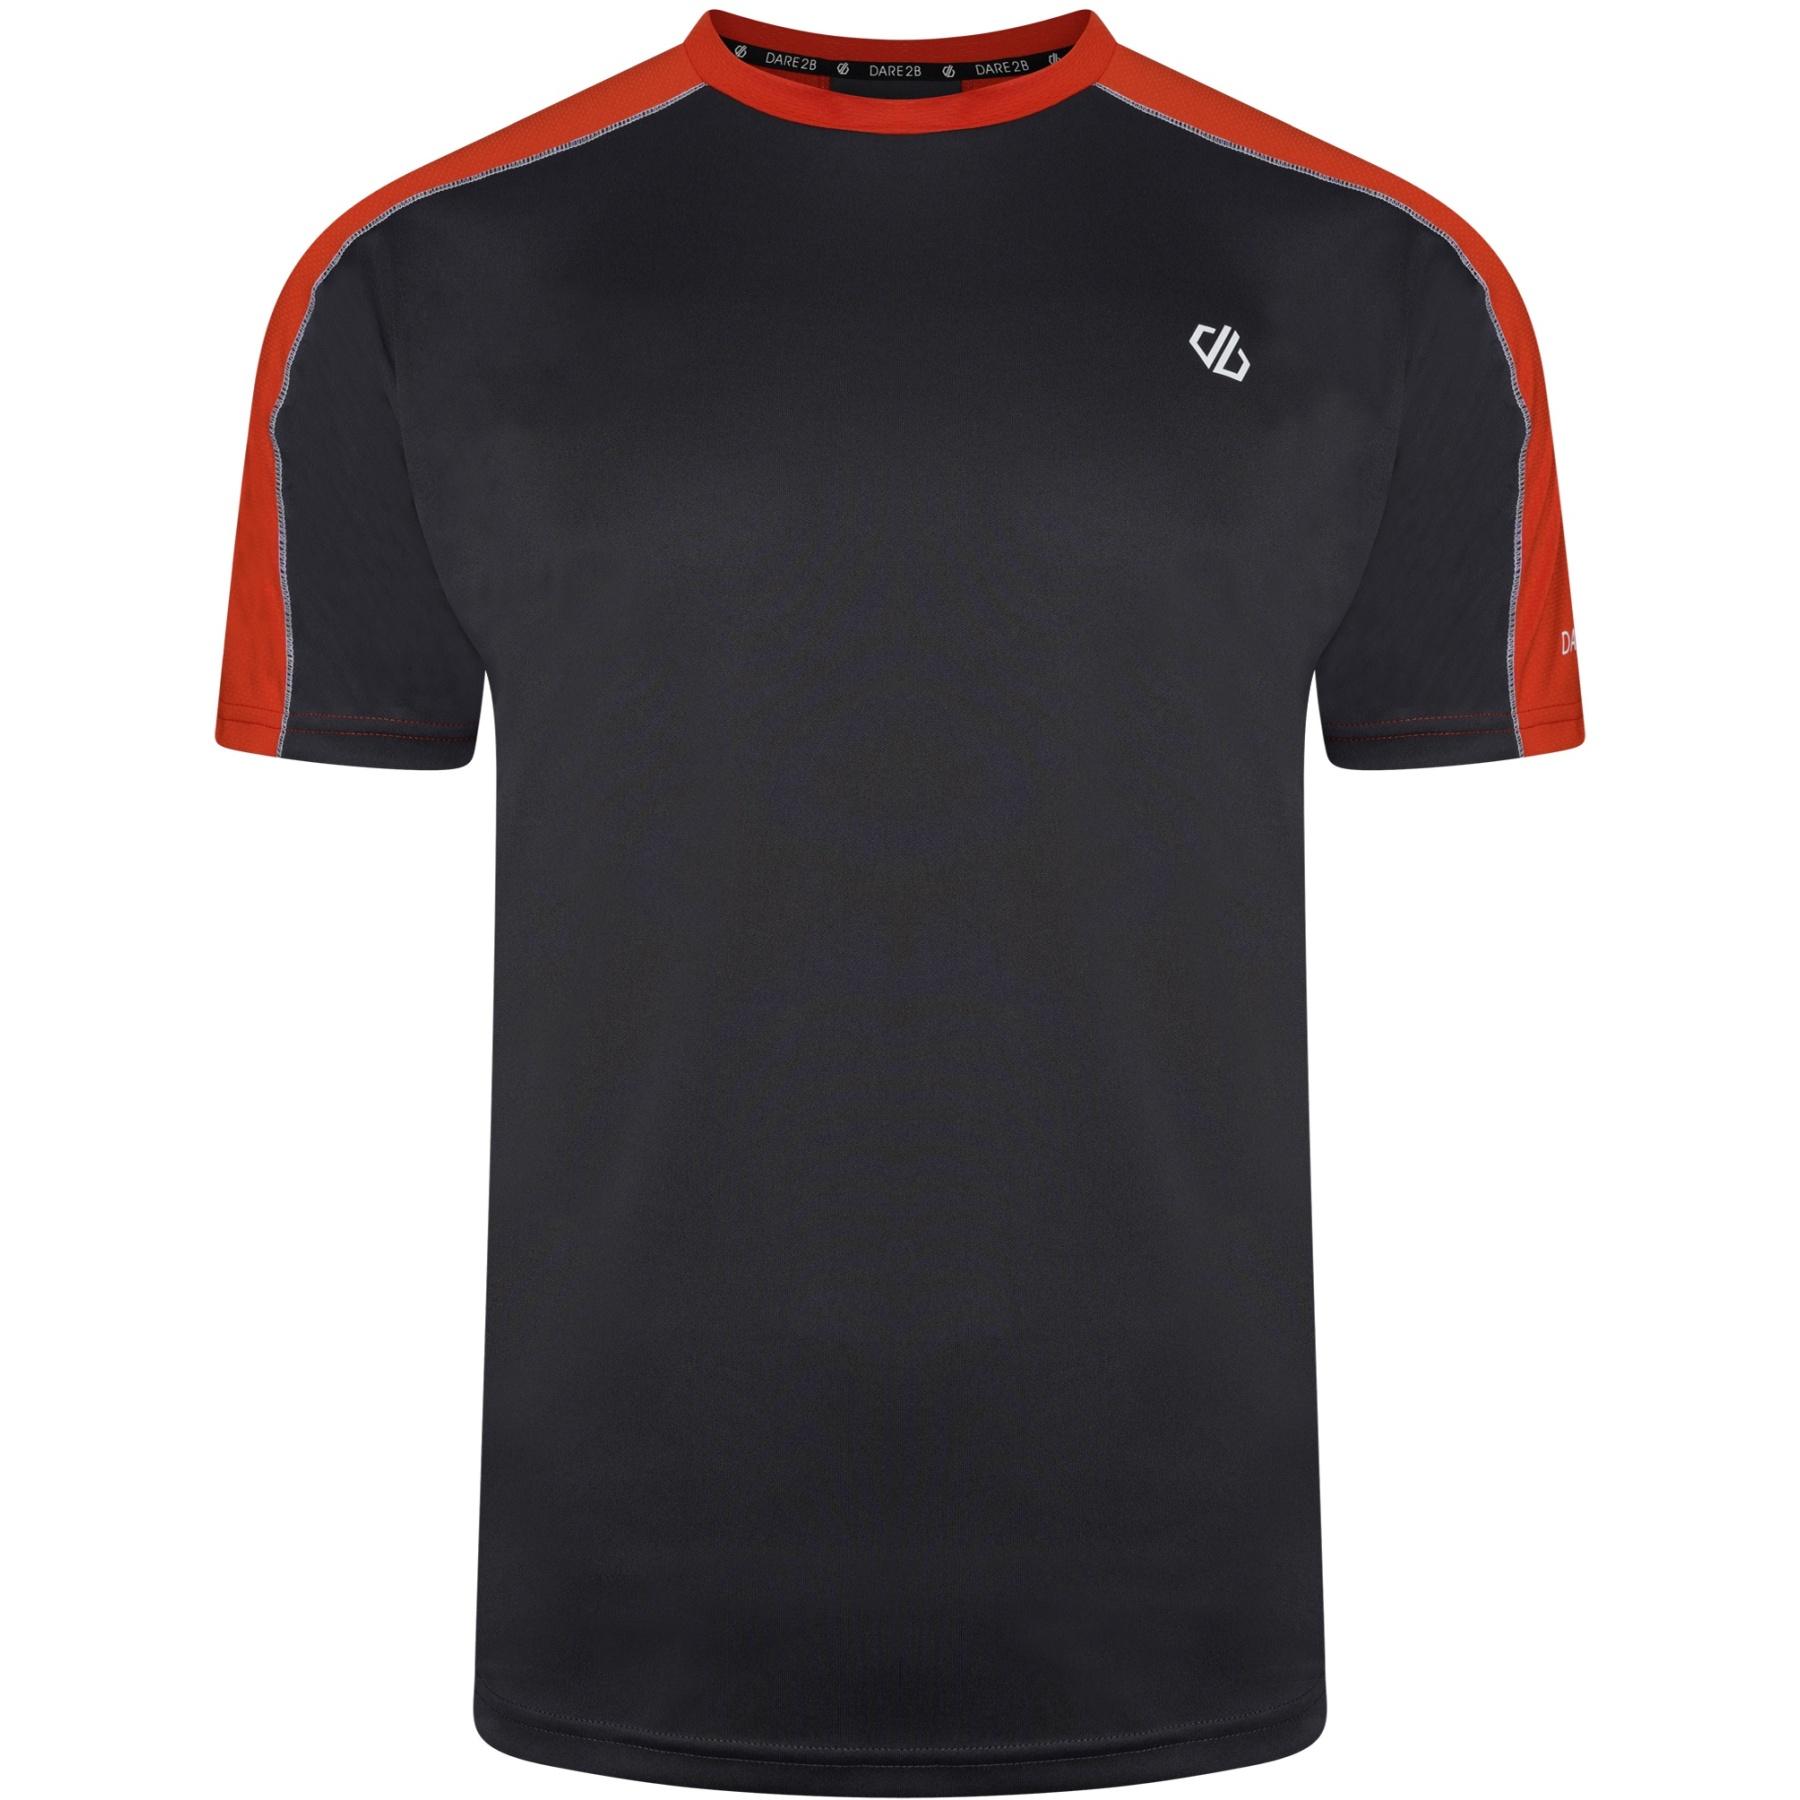 Dare 2b Discernible Tee Shirt - IID Ebony Grey/Trail Blaze